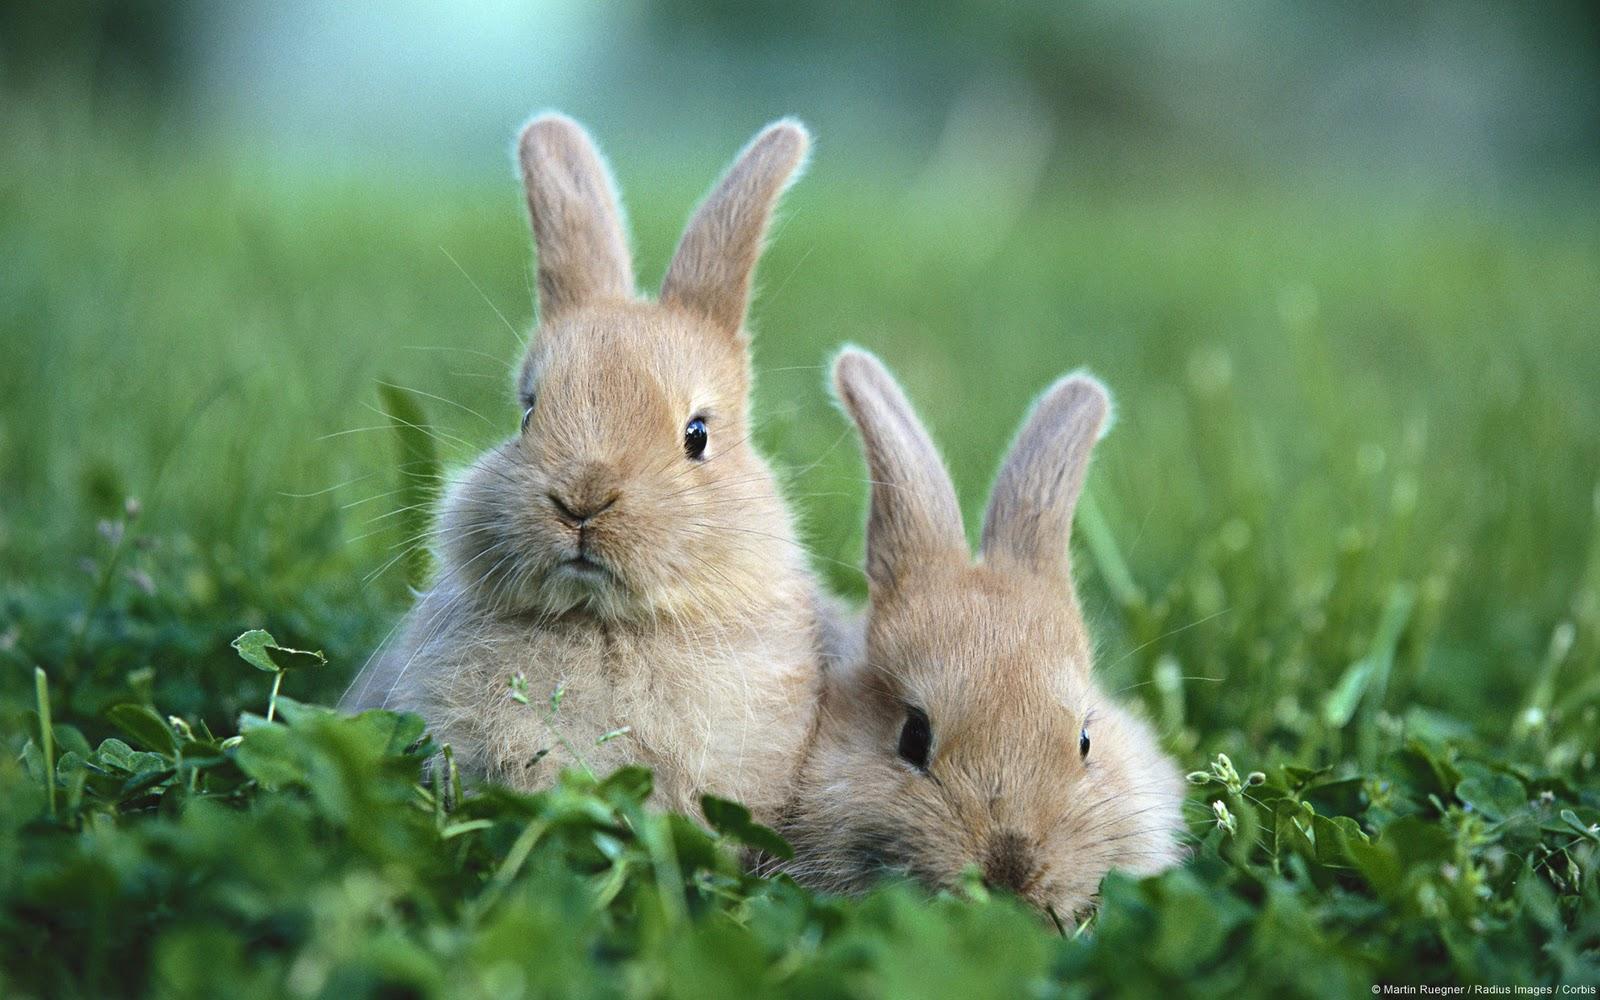 cute rabbits rabbit animals funny bunny bunnies animal rabit rabits sweet adorable pretty windows lapin grass pic cutie bunnies2 wallpapers